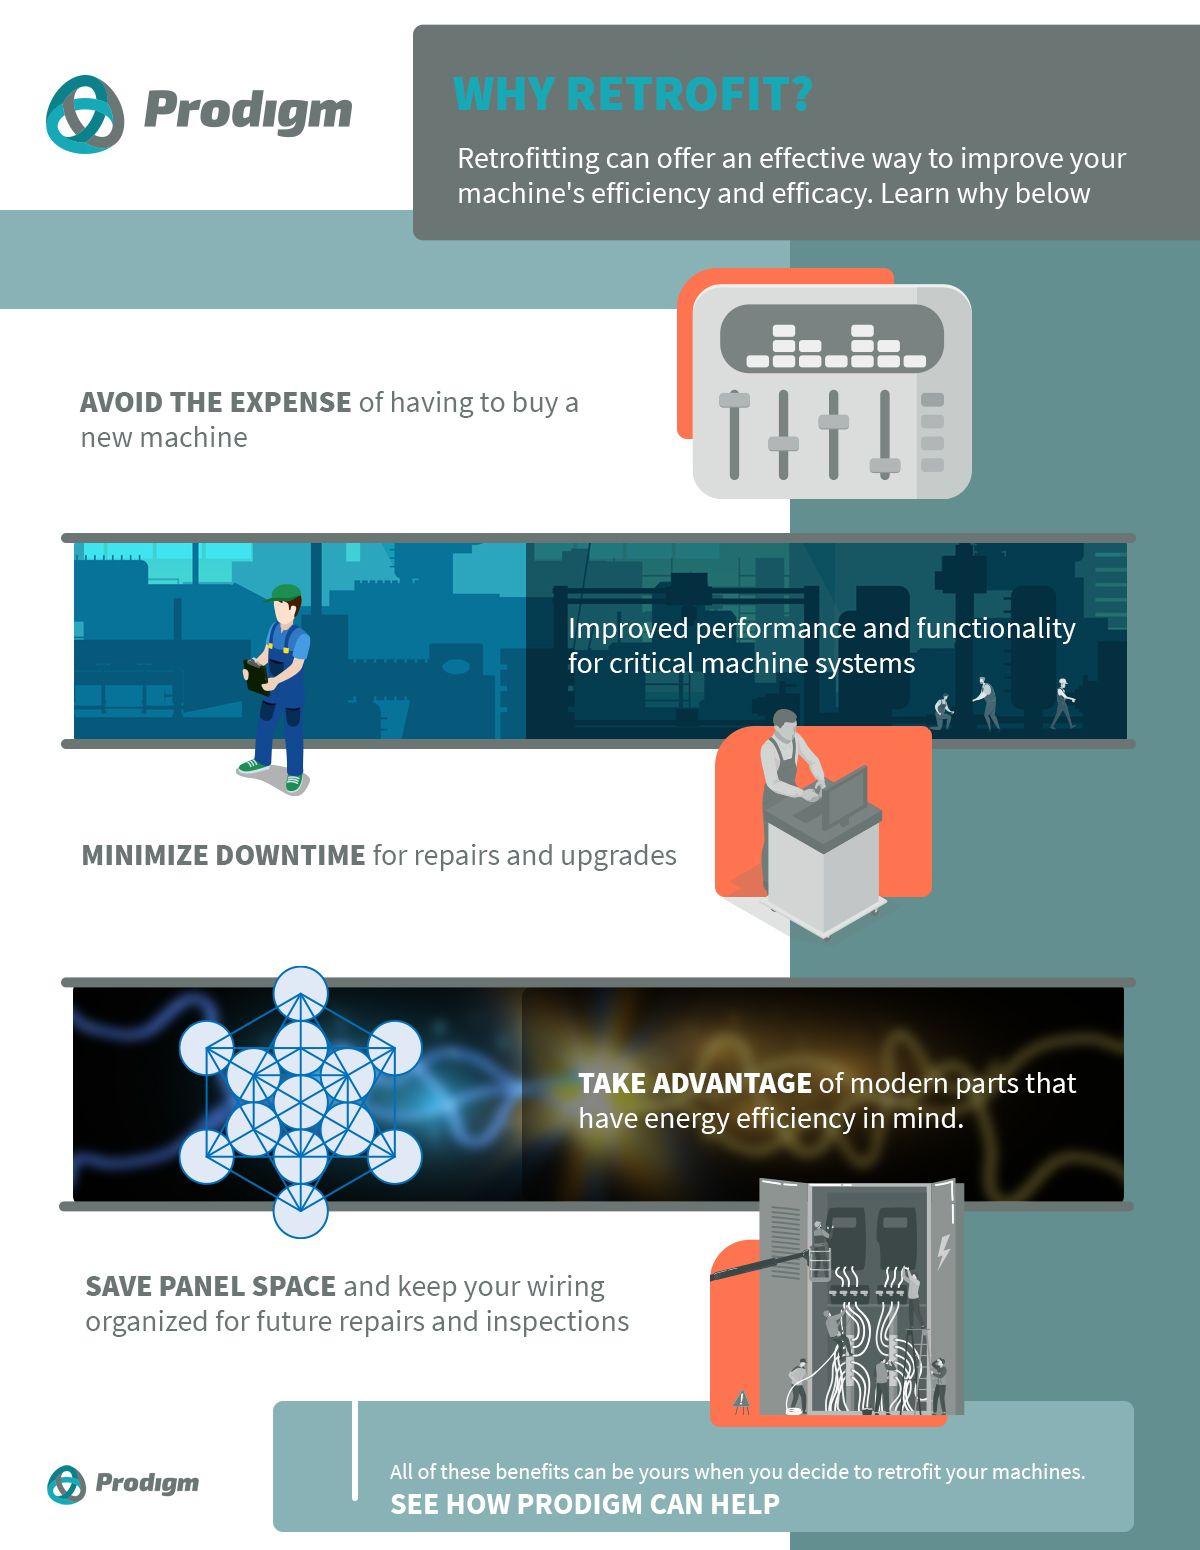 2021_04-07_Prodigm_Infographic.jpg